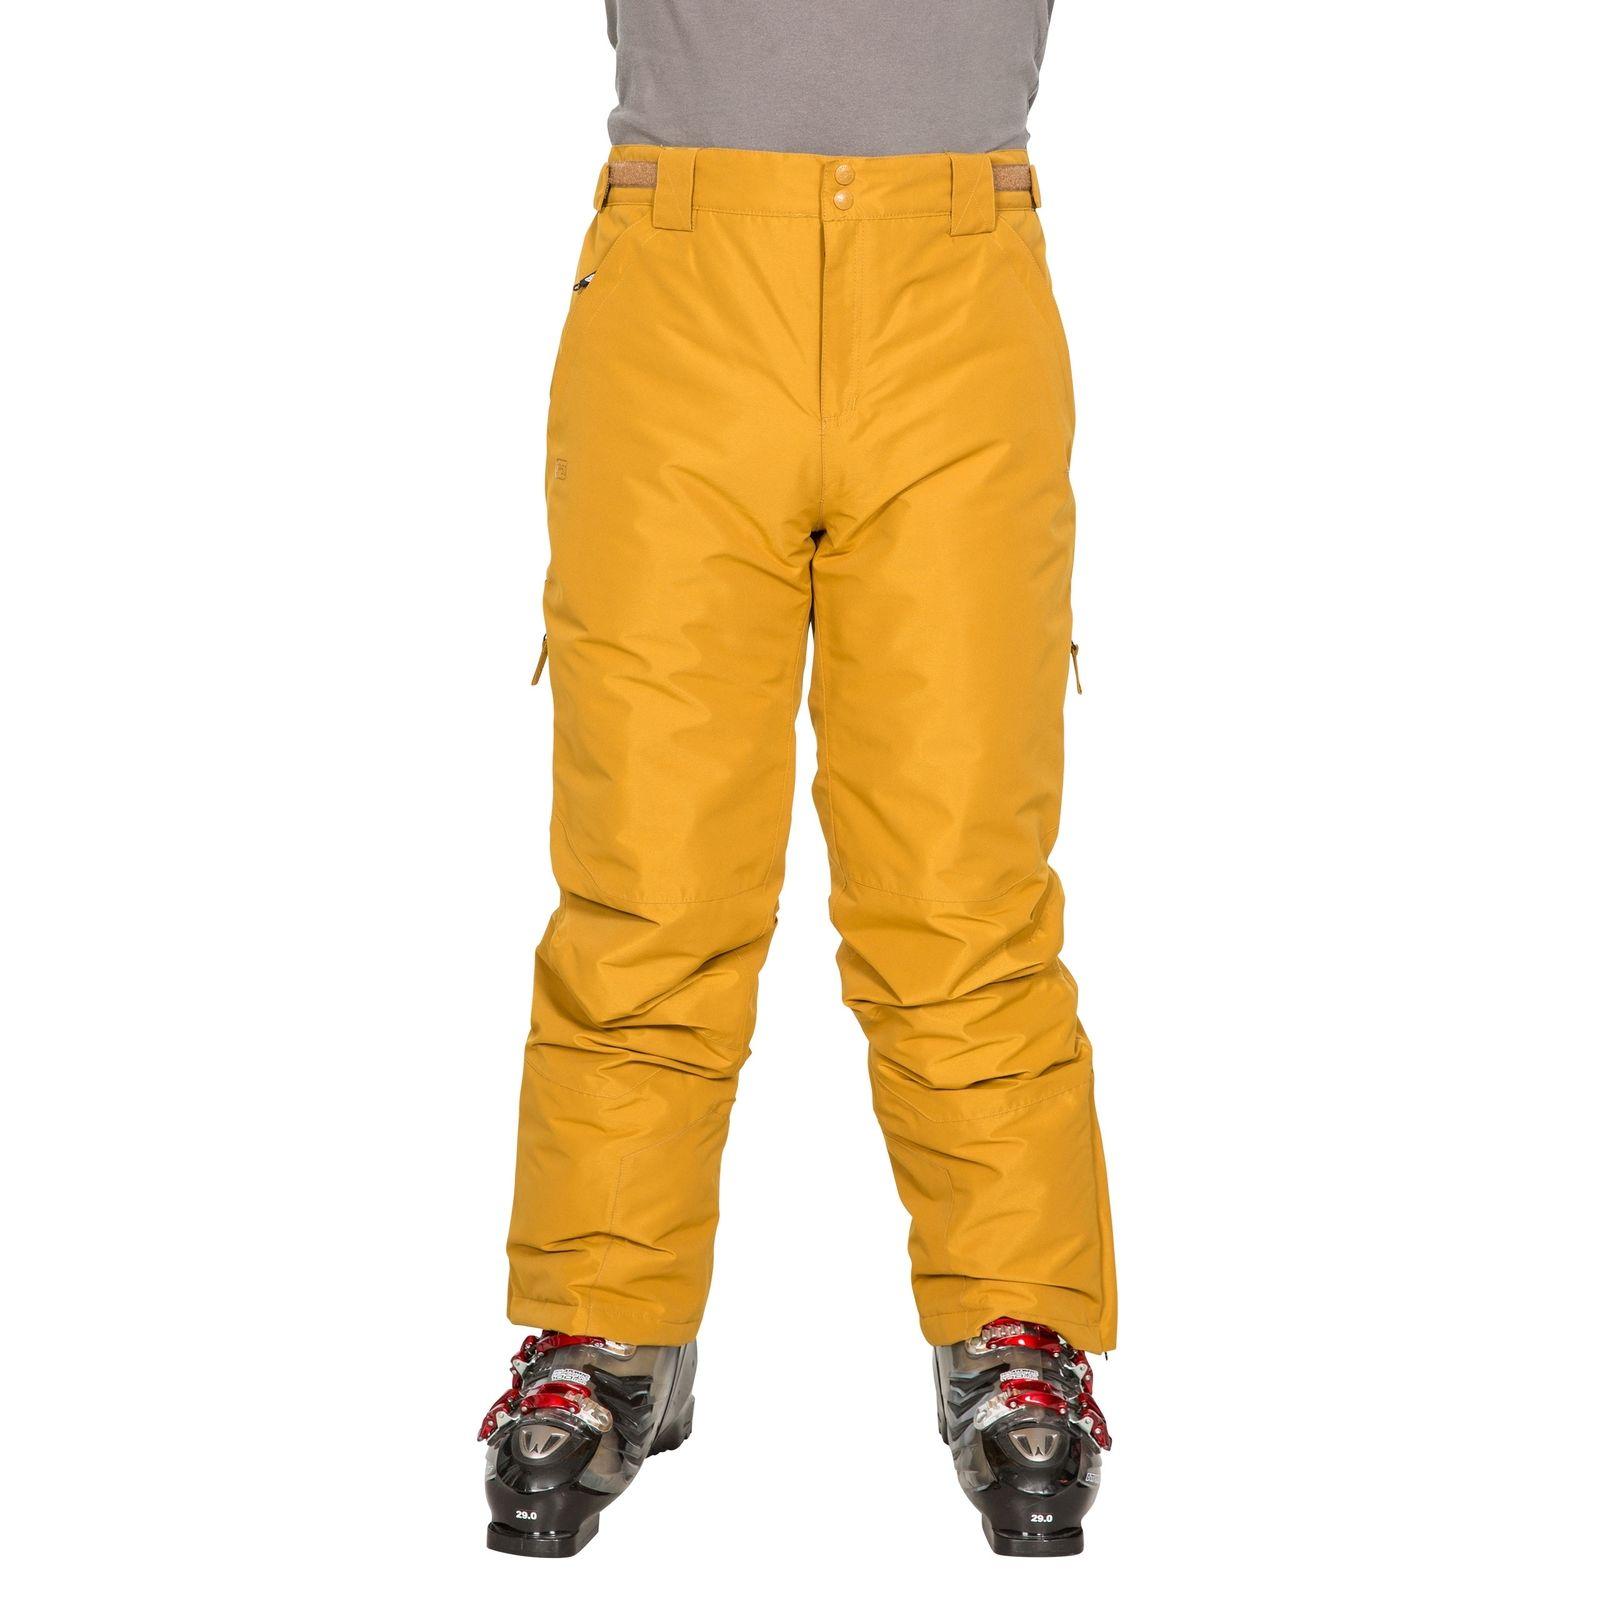 Trespass Skihose Herren Roscrea wetterfest | Sportbekleidung > Sporthosen > Skihosen | Braun | Trespass